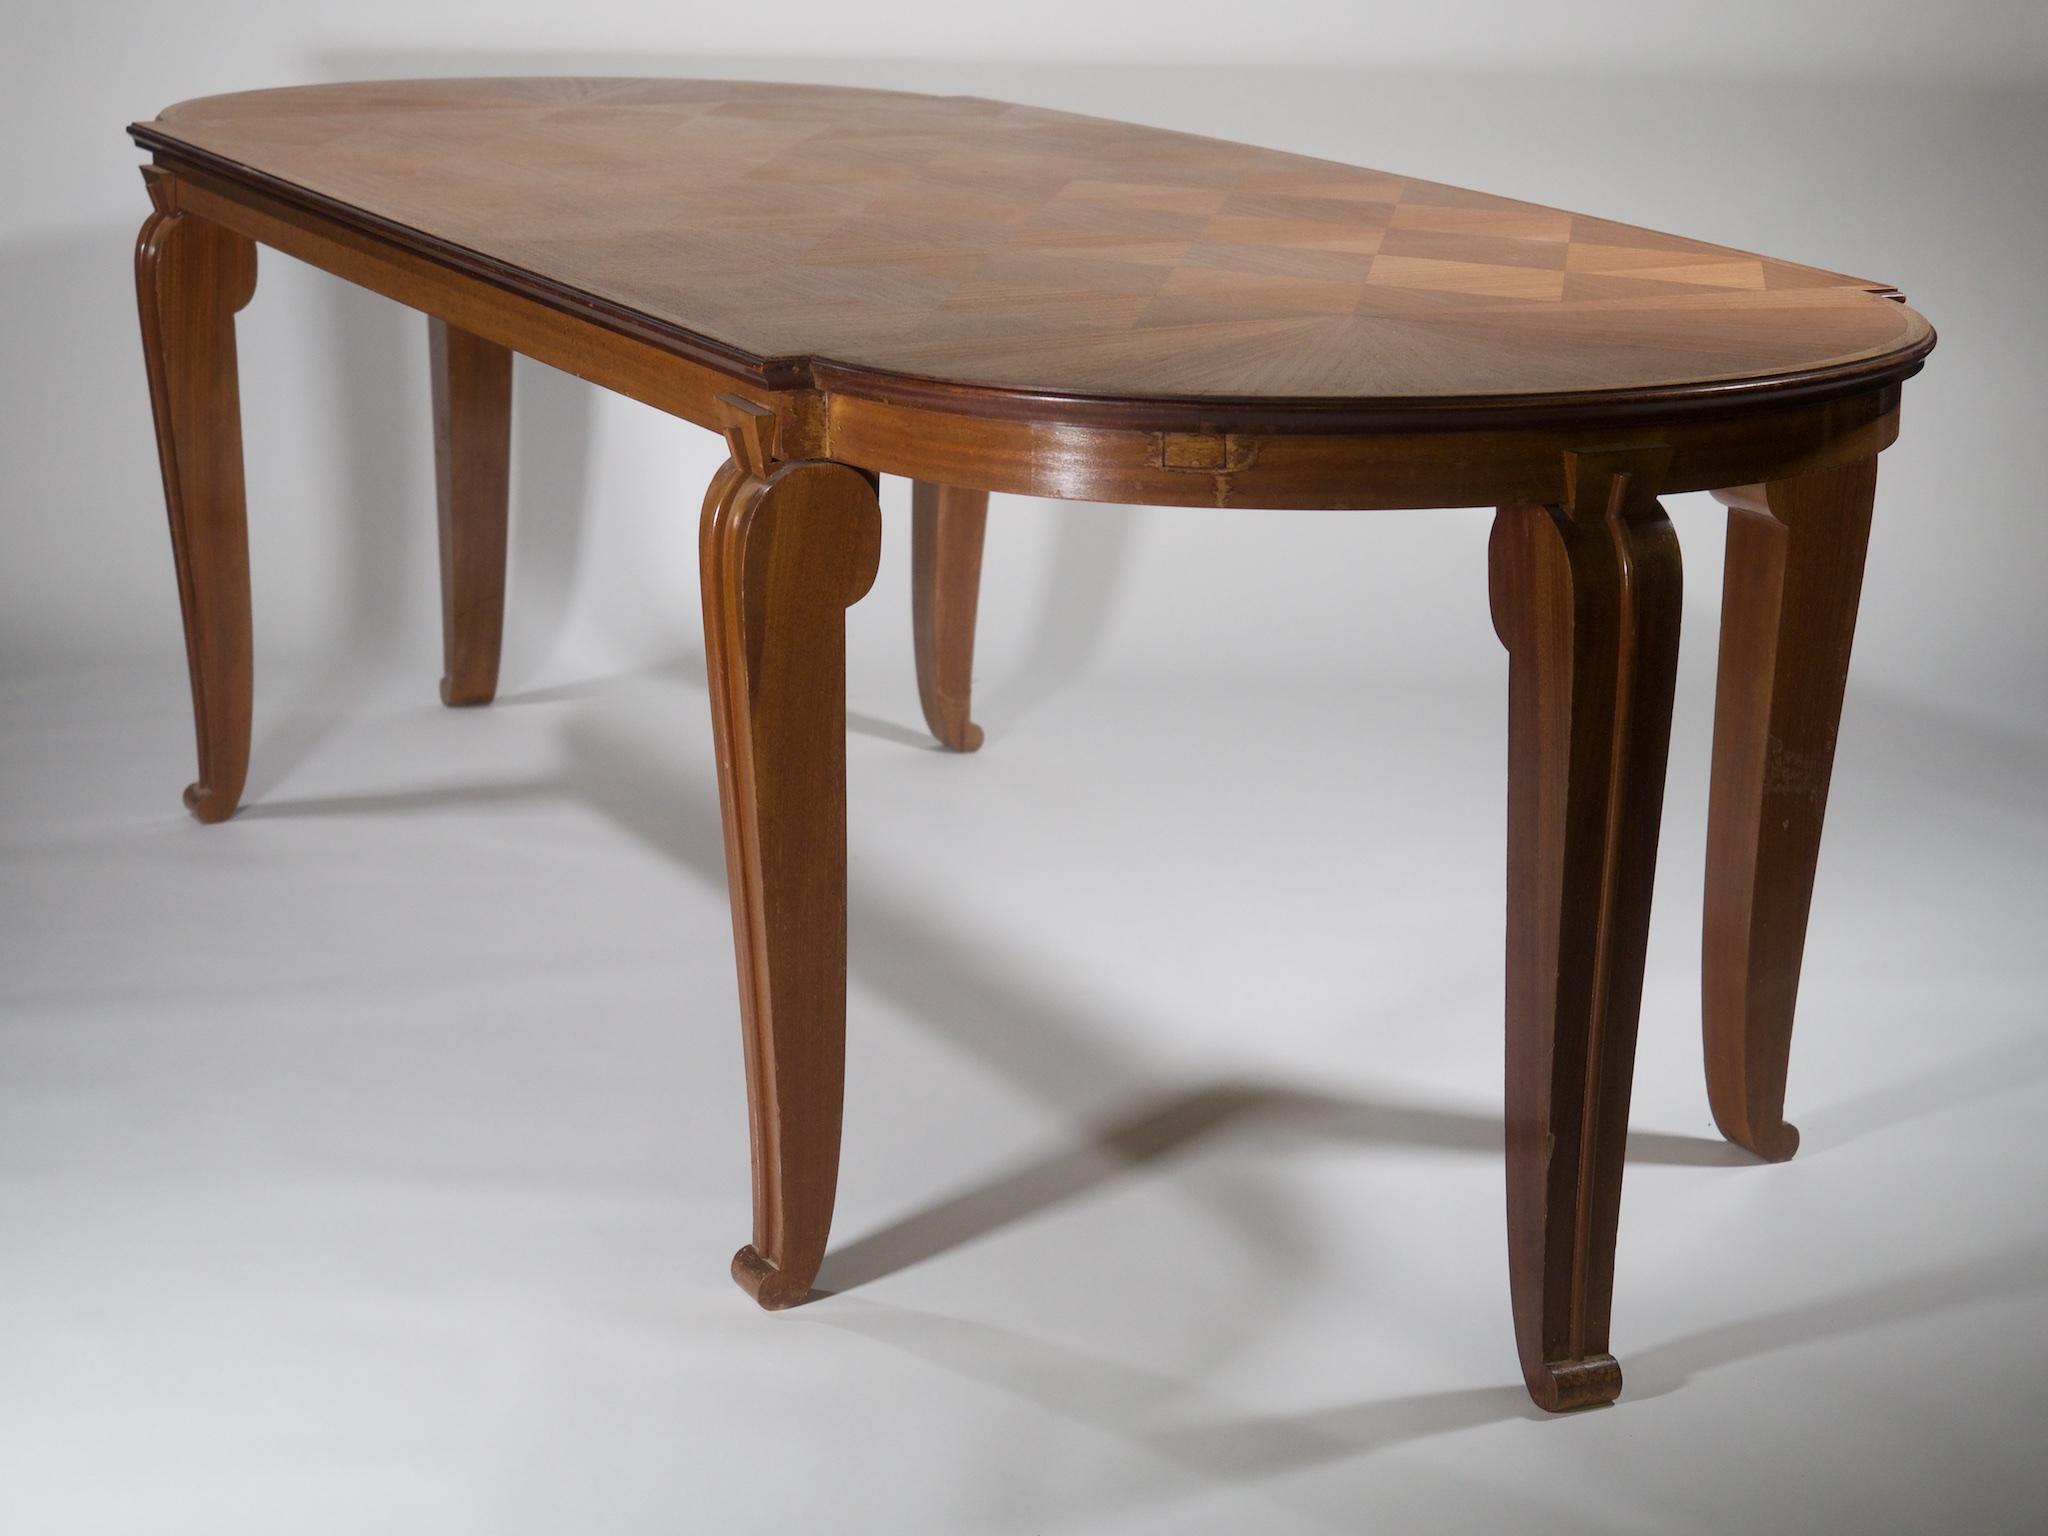 Andre+Arbus+dining+table+646.jpg